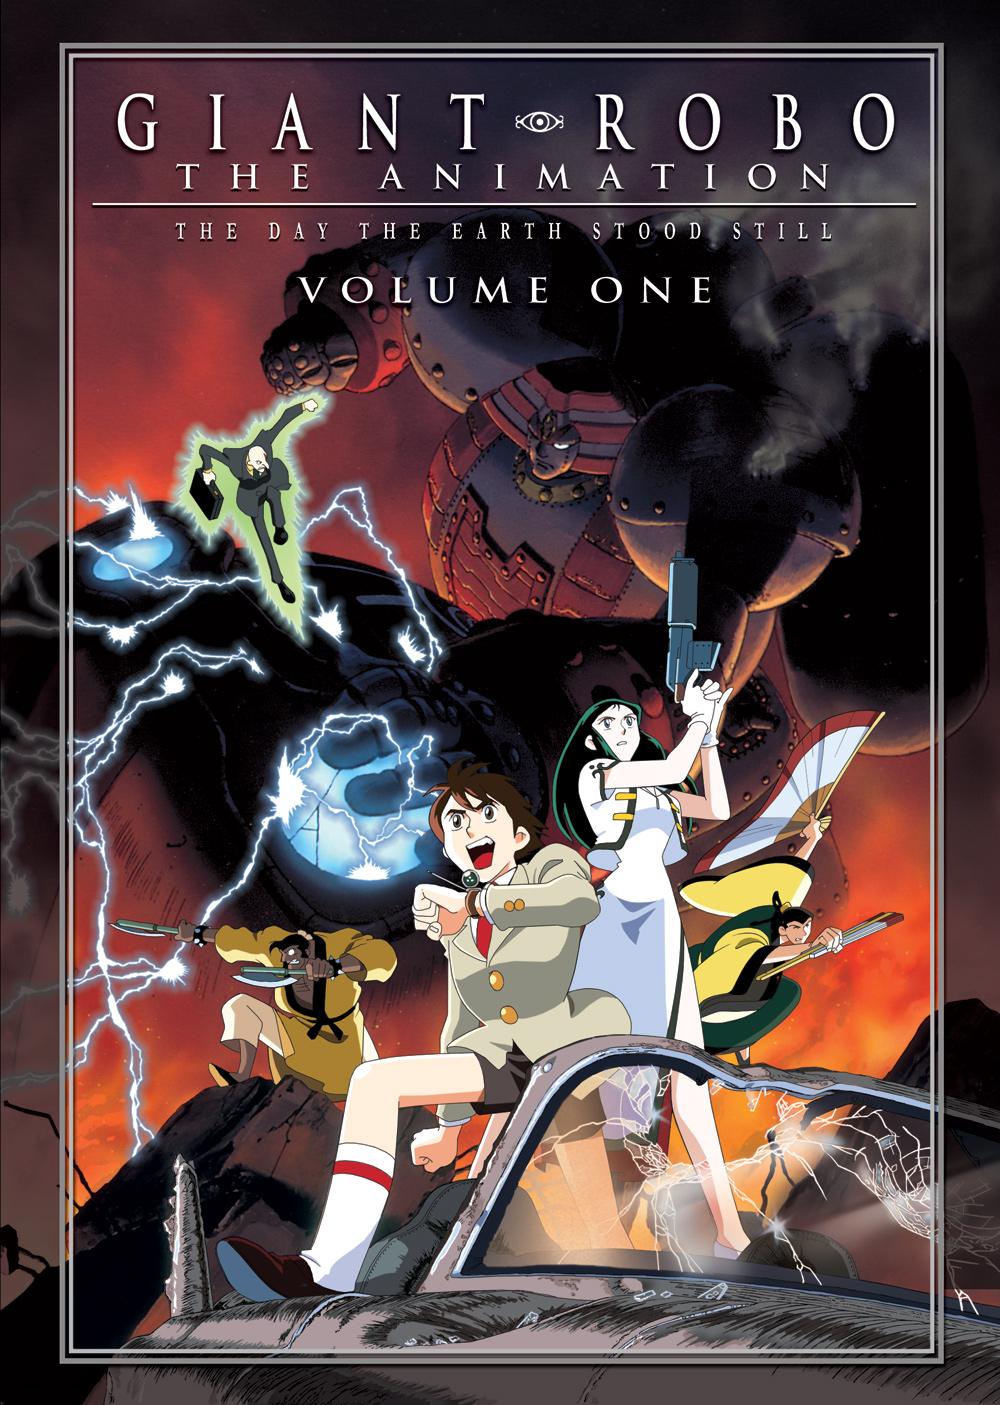 Giant Robo DVD volume 1